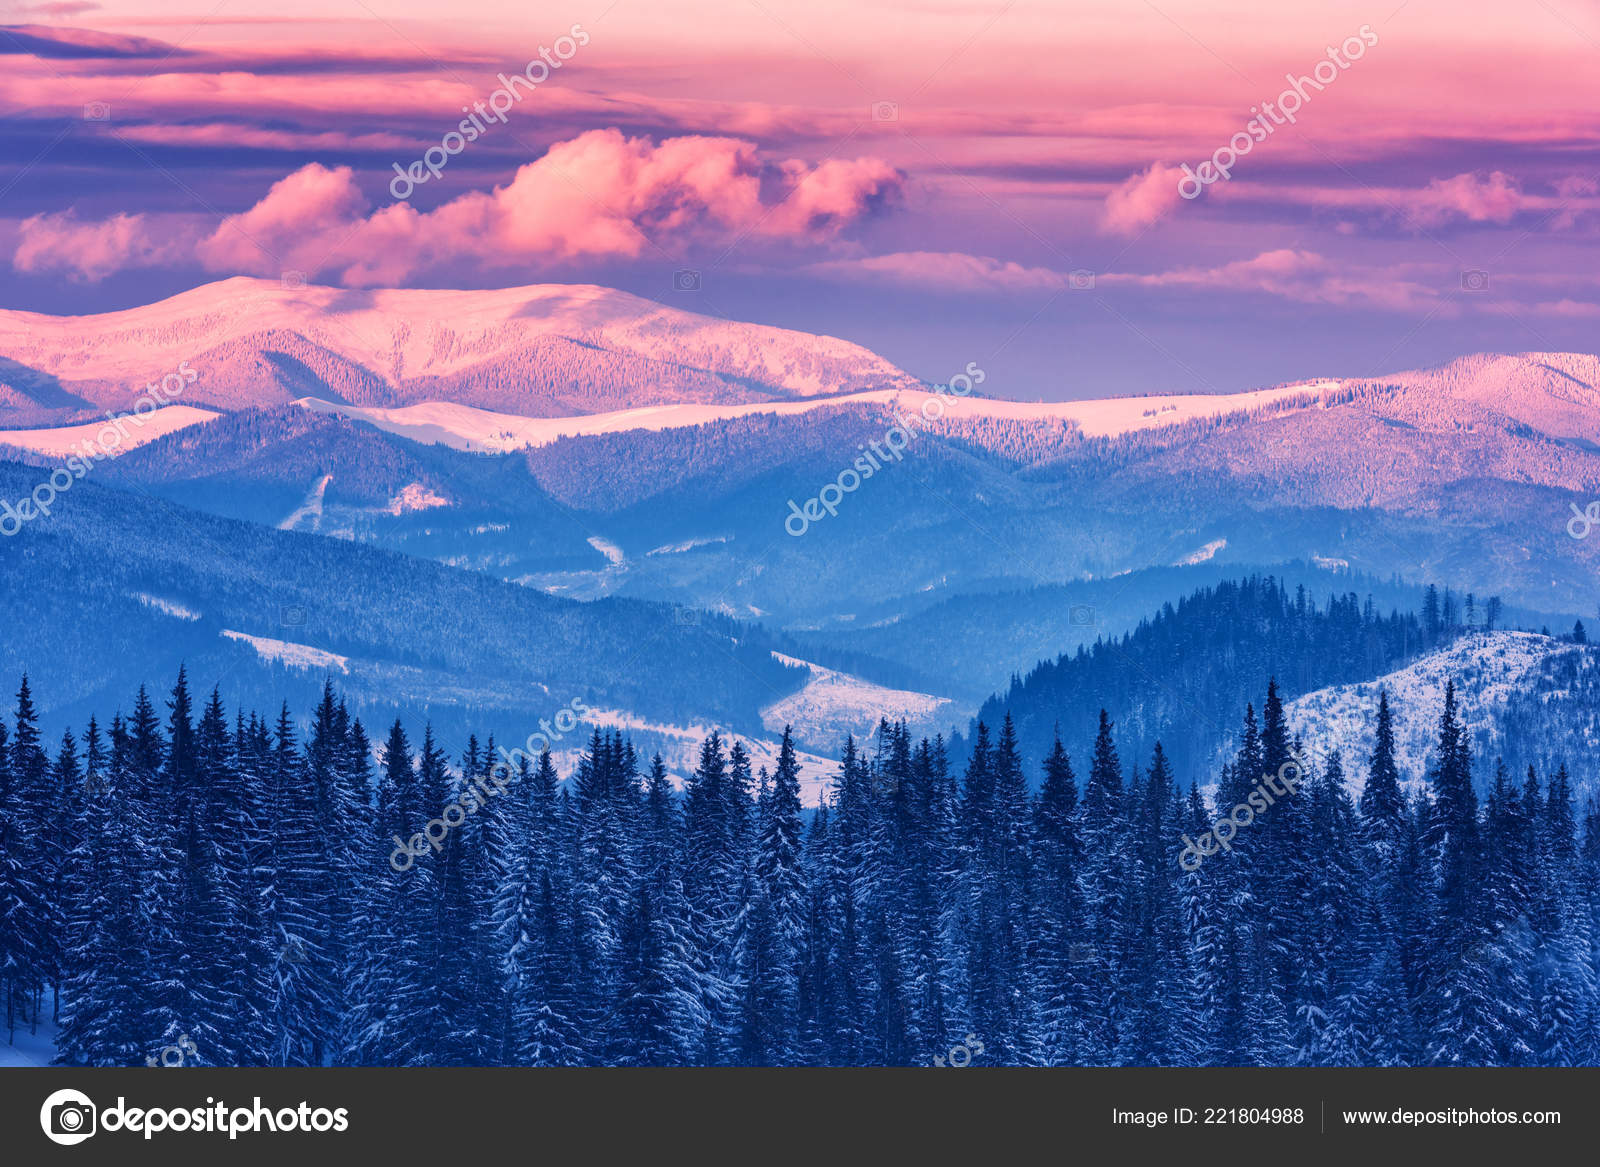 Mountain Christmas Tree.Beautiful Winter Landscape Snowy Mountains Christmas Trees